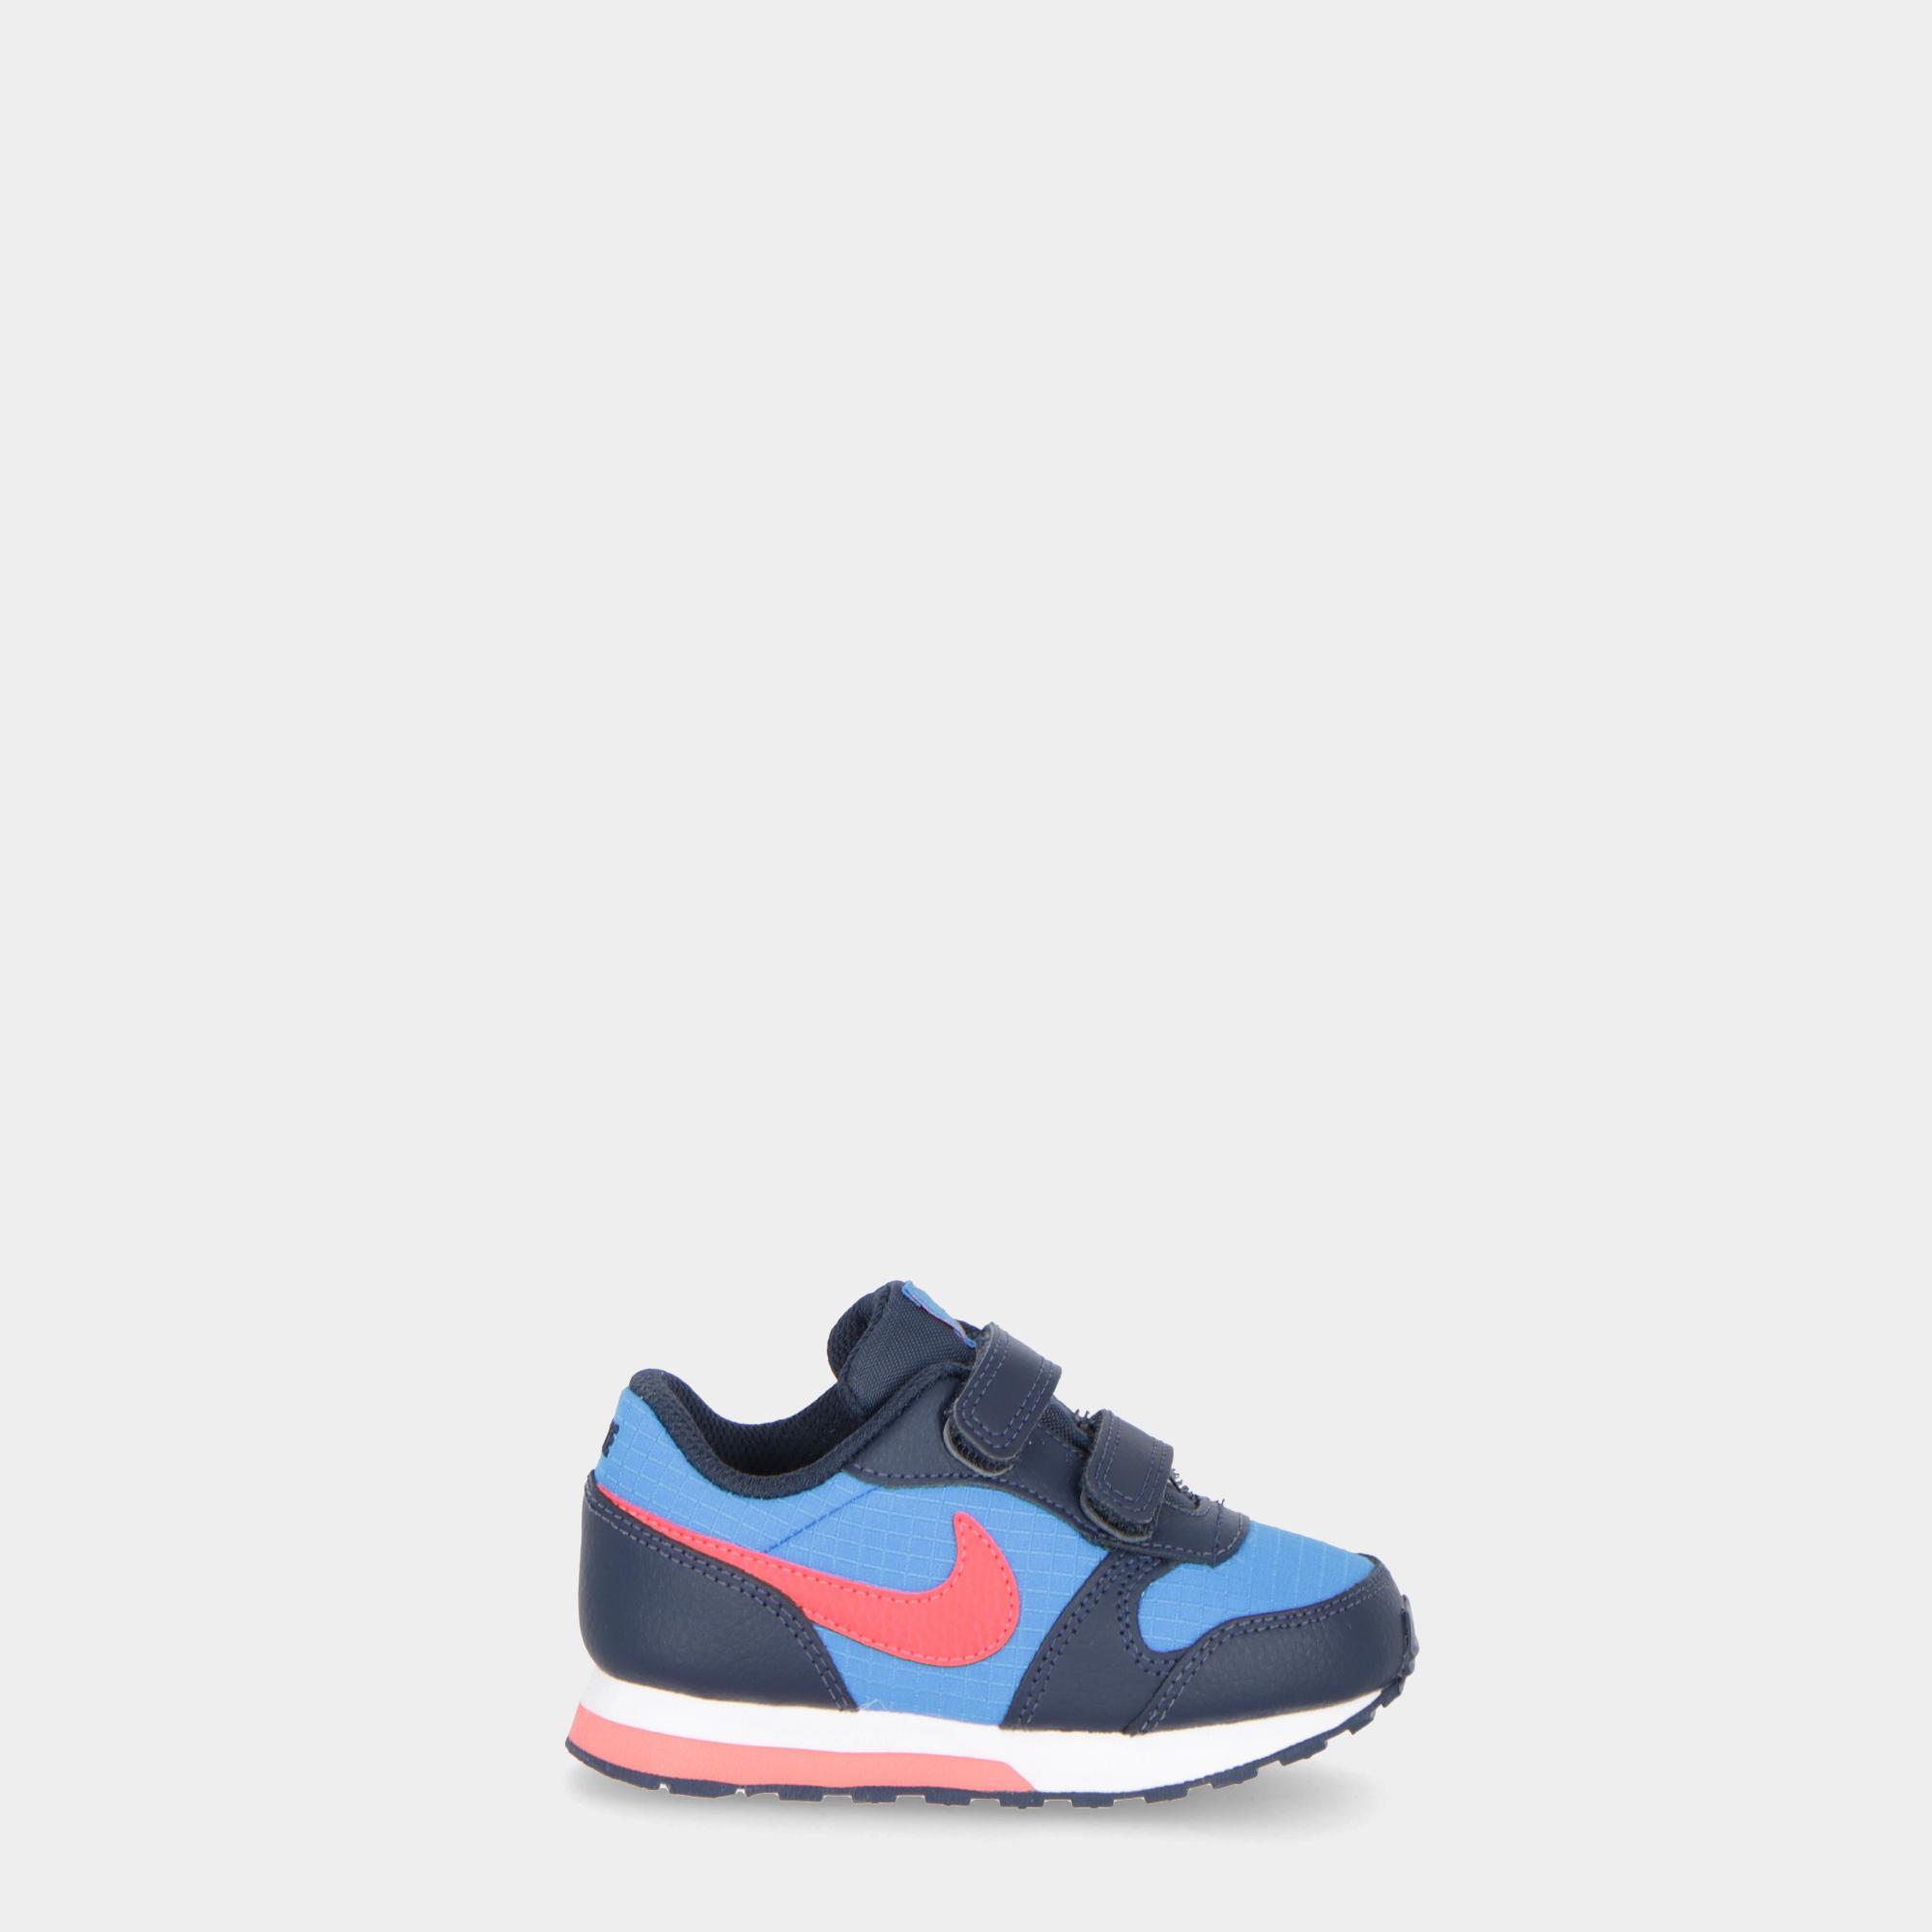 outlet store 19a39 71949 Nike Md Runner 2 (tdv) - Kids br   Blue crimson